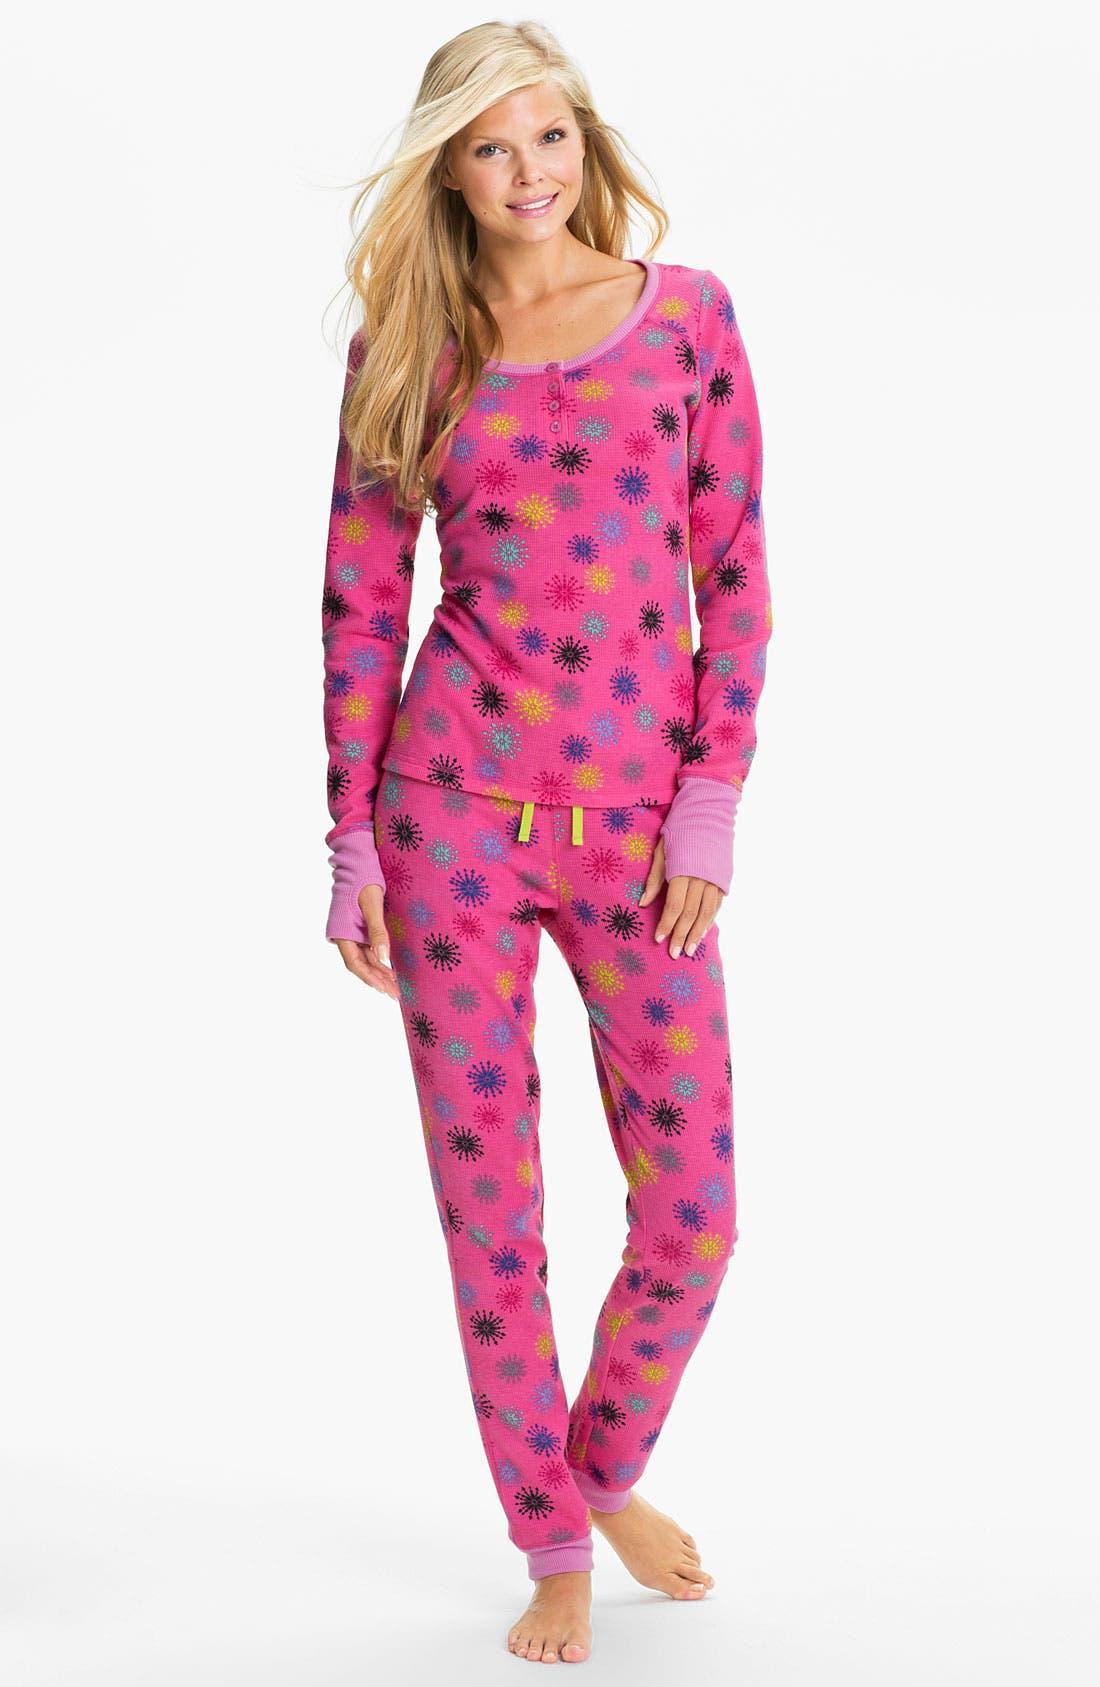 Main Image - Steve Madden 'Cozy Up' Print Thermal Pajamas